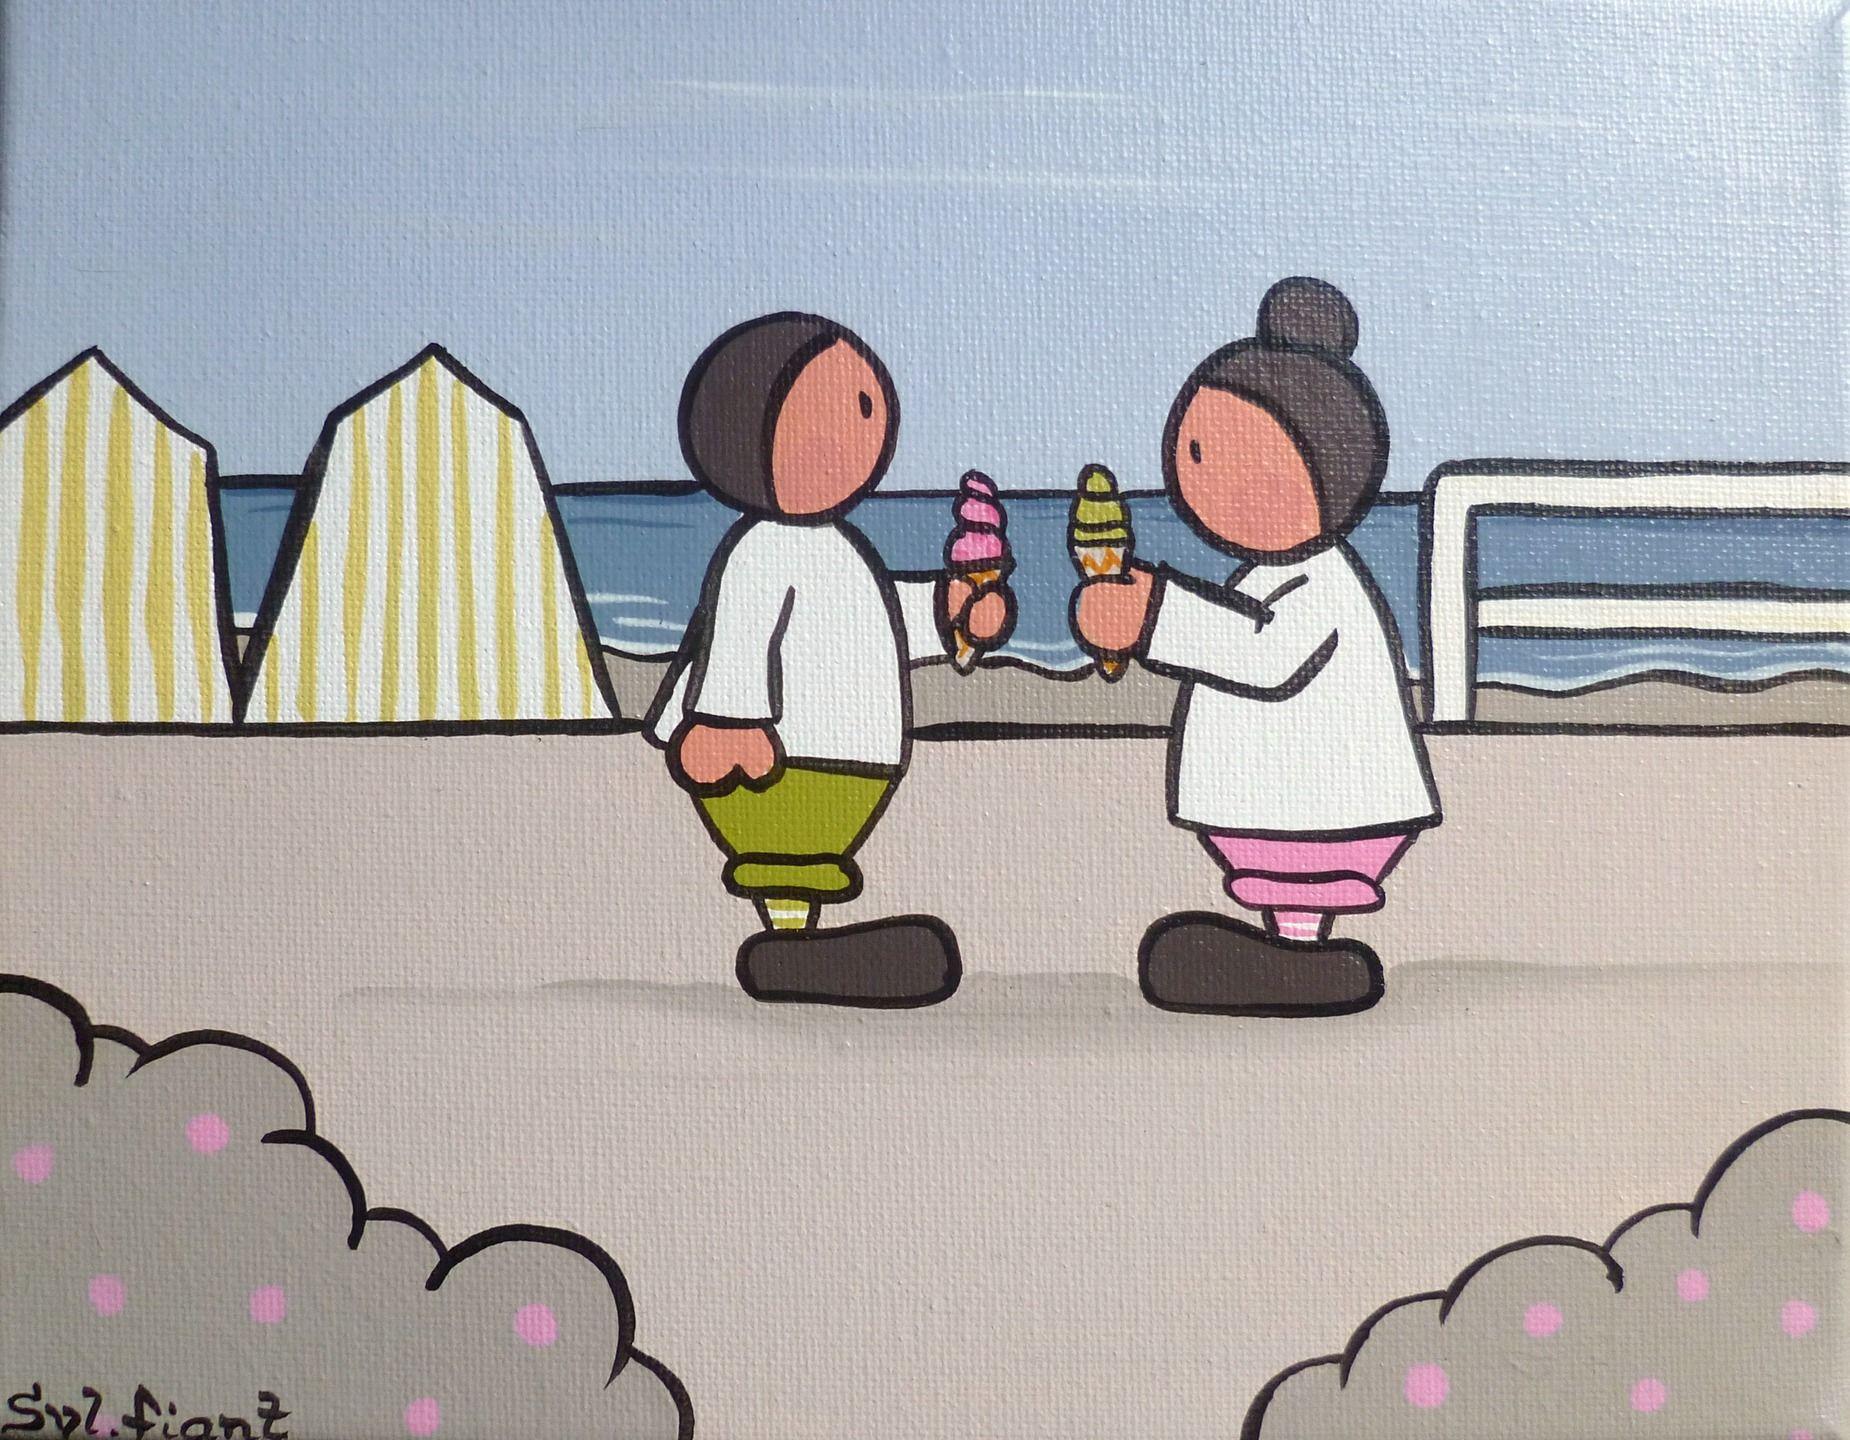 Tableau bord de mer sc ne de plage vert rose et taupe - Dessin bord de mer ...